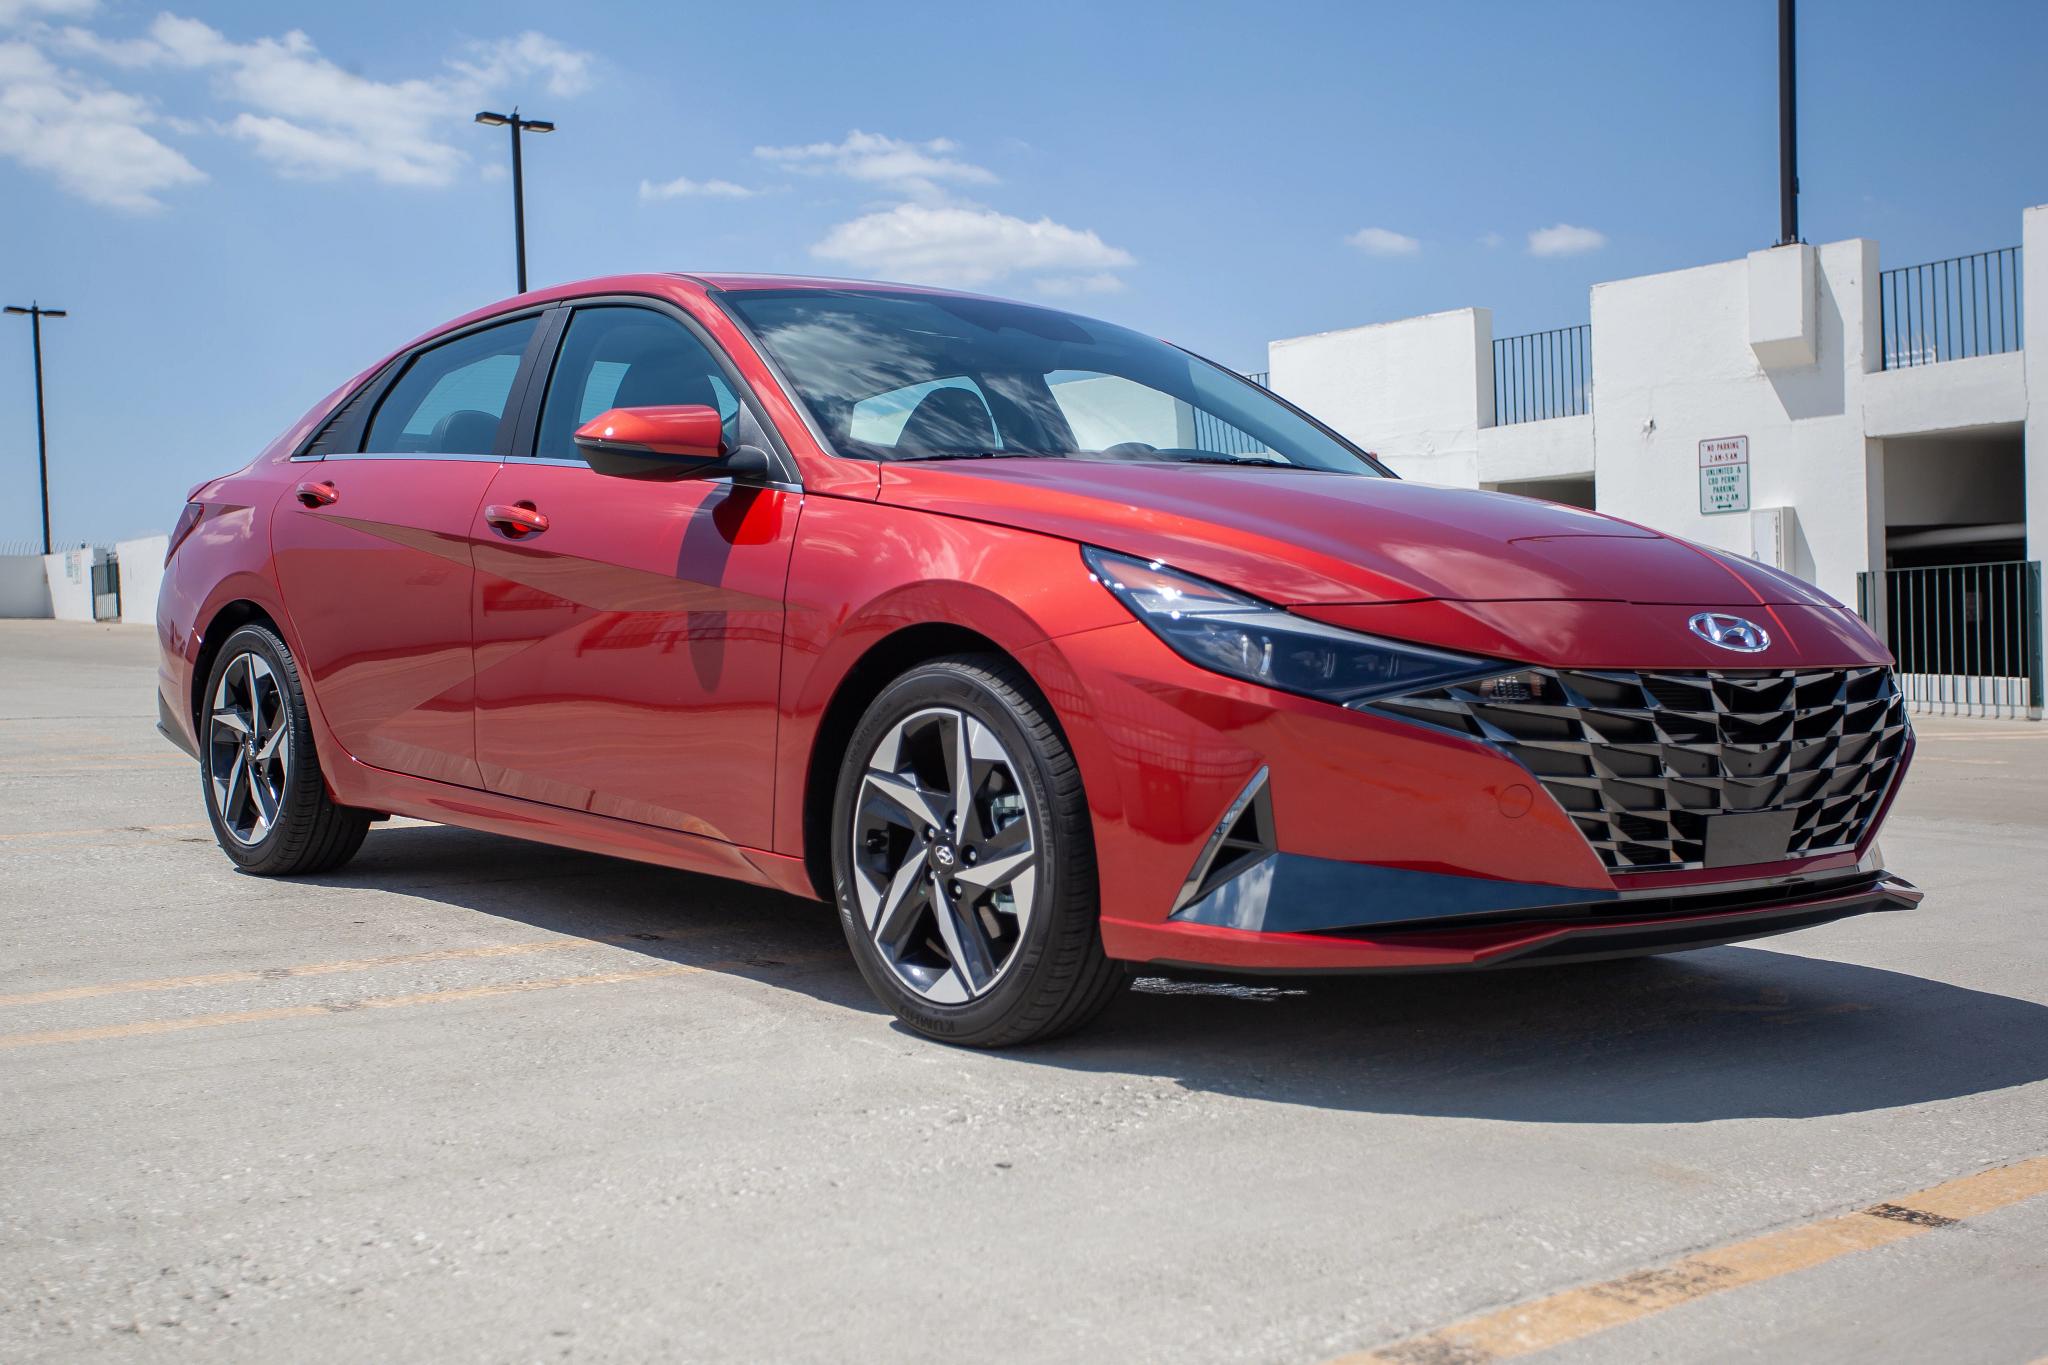 2021 Hyundai Elantra First-Look Video: Interior, Tech … and Triangles